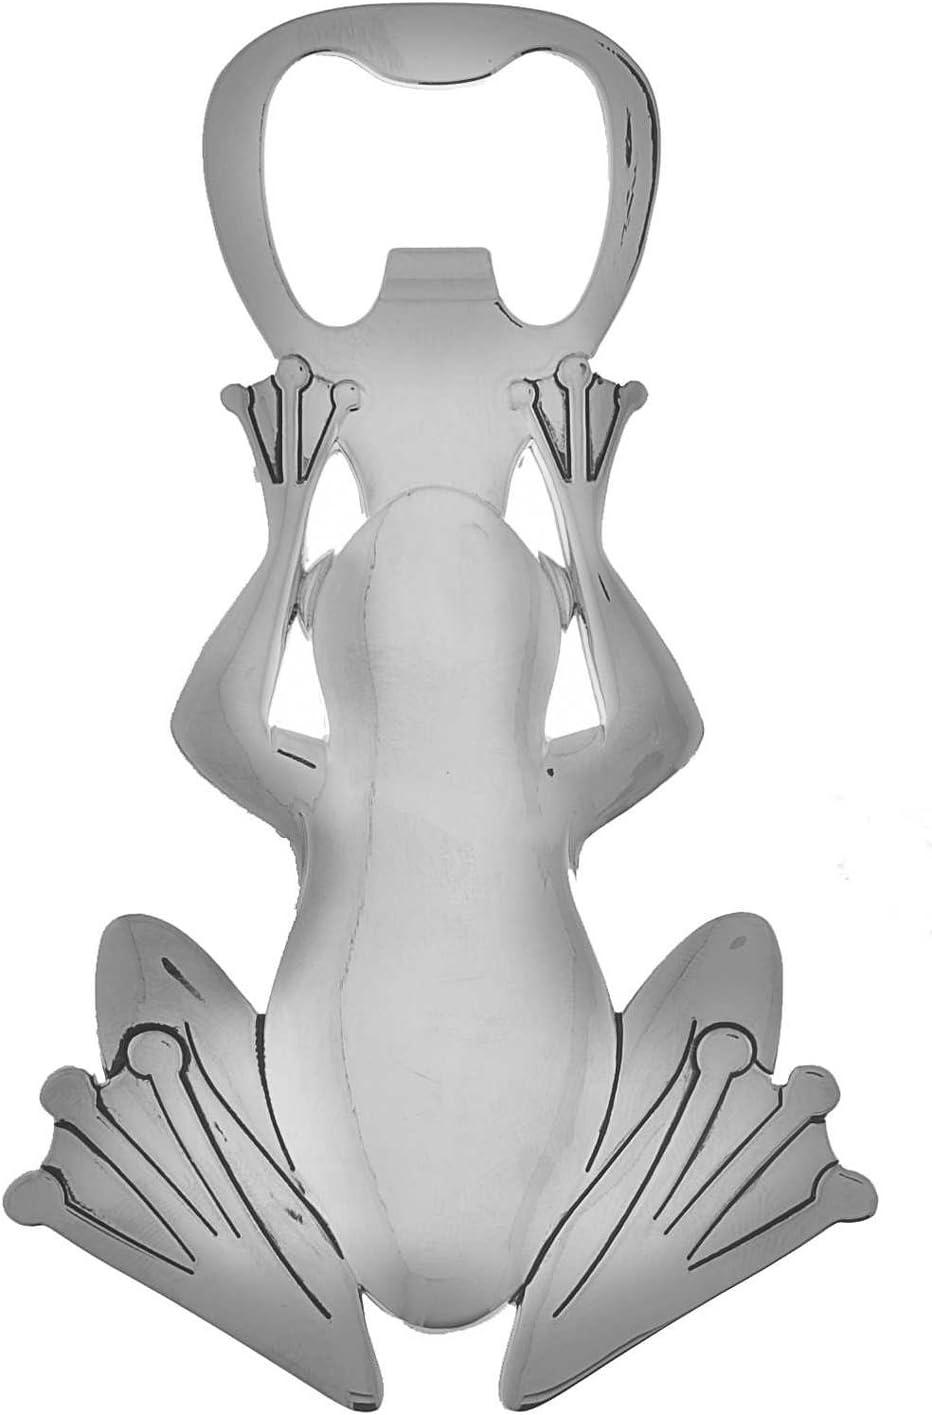 Metal Bottle Opener From Ganz Frog Kitchen Dining